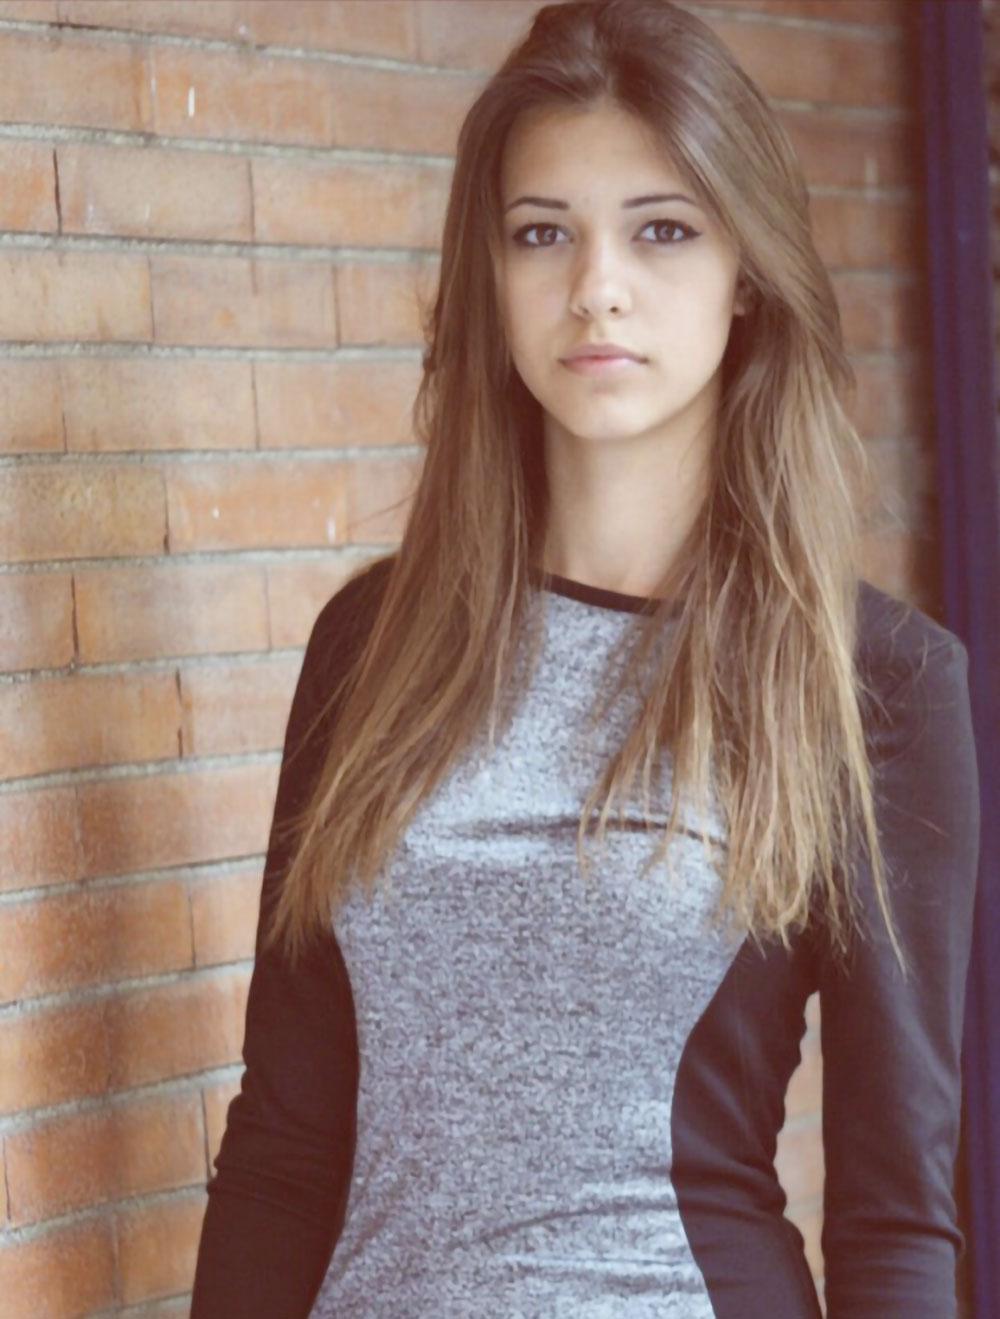 Sabina - I am management